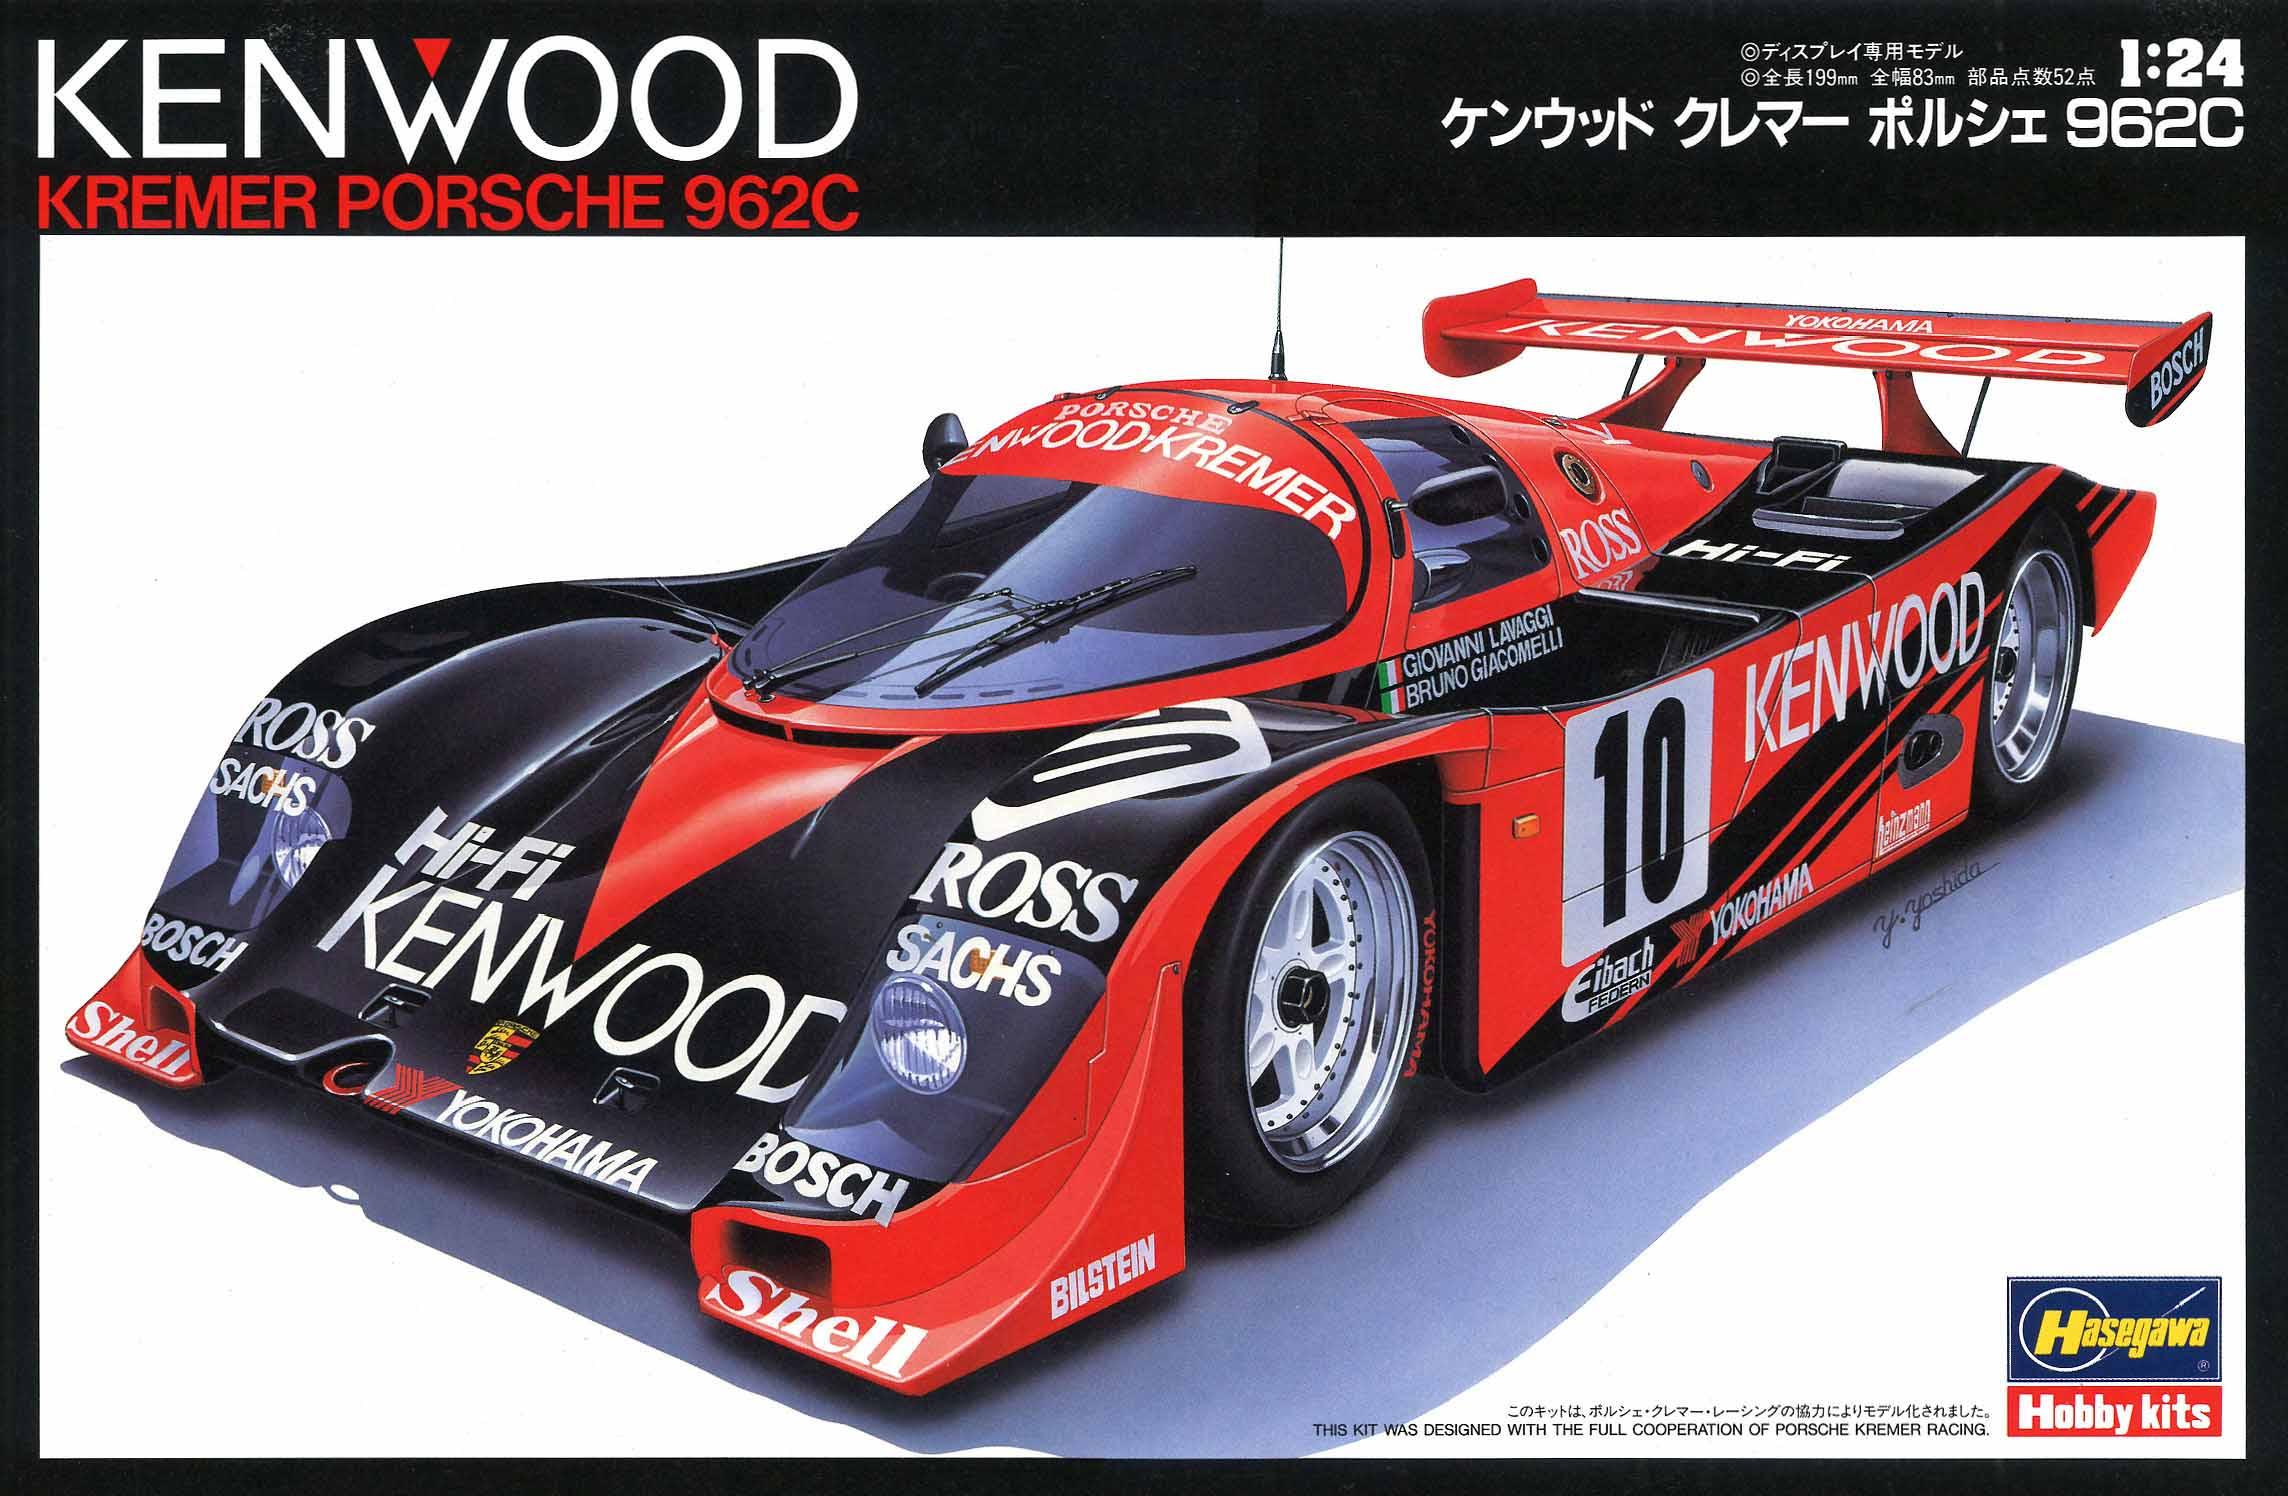 Hasegawa 1/24 Kenwood Kremer Porsche 962C